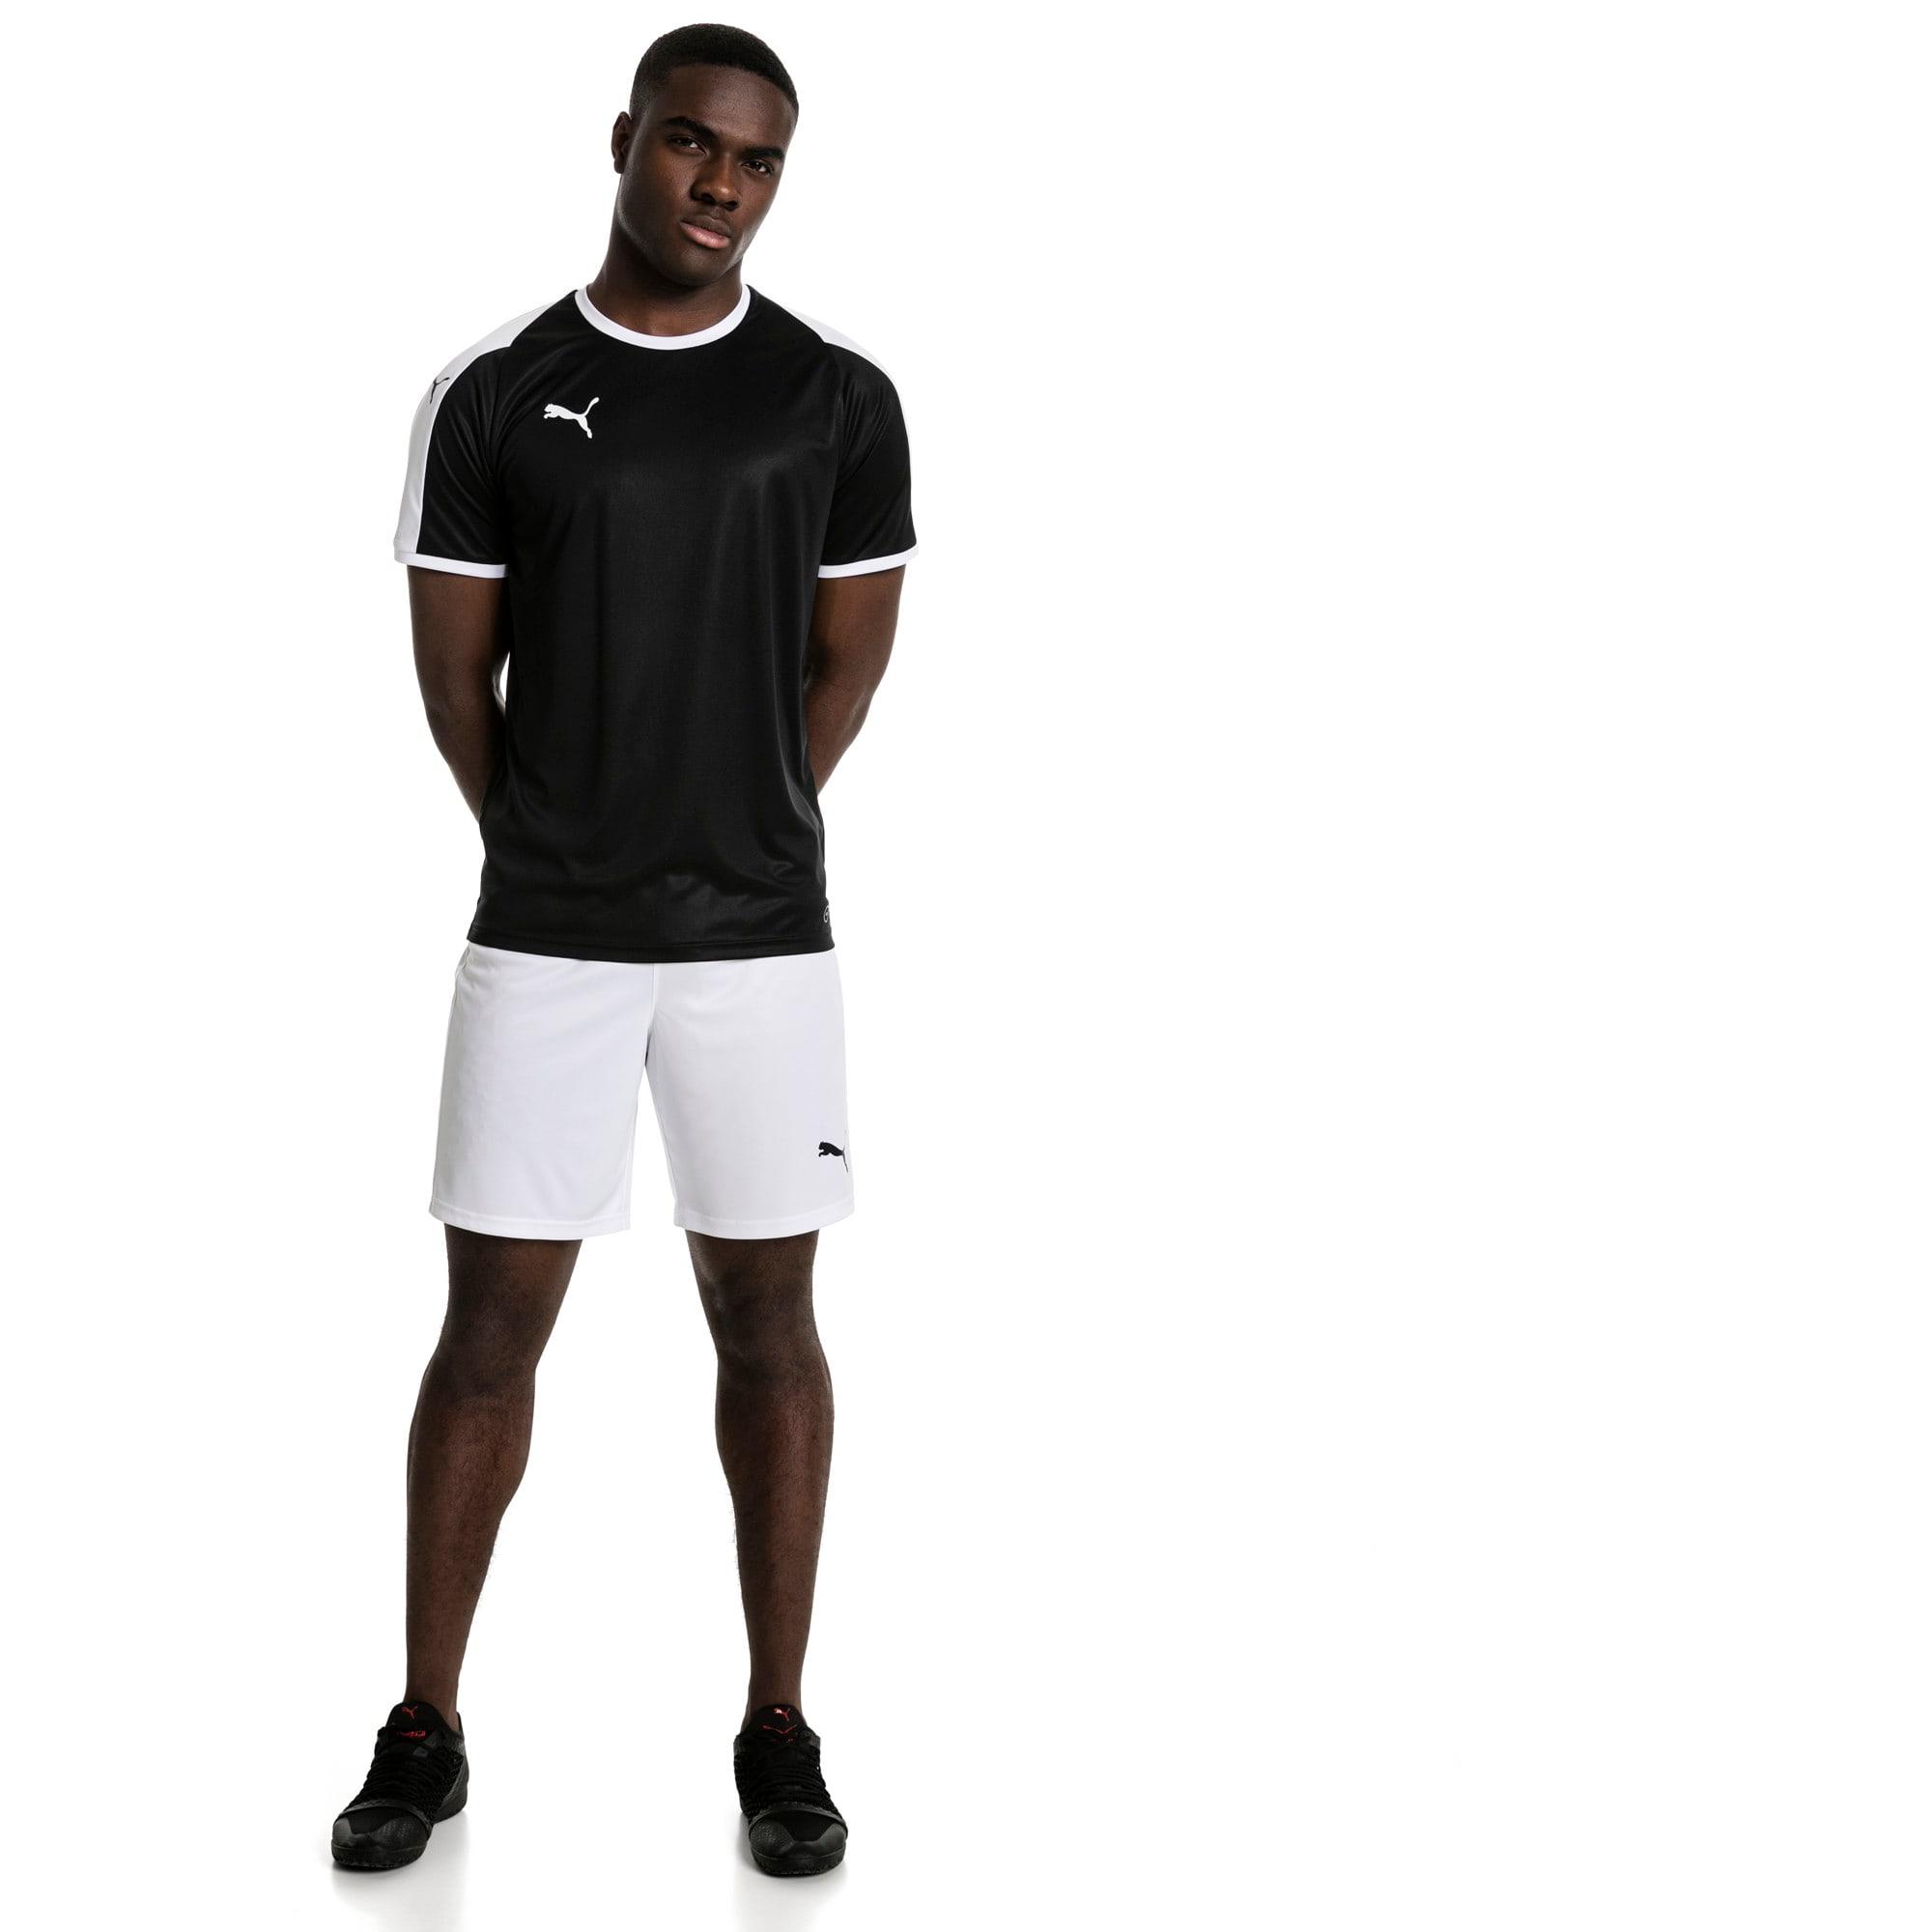 Thumbnail 3 of Liga shirt voor heren, Puma Black-Puma White, medium